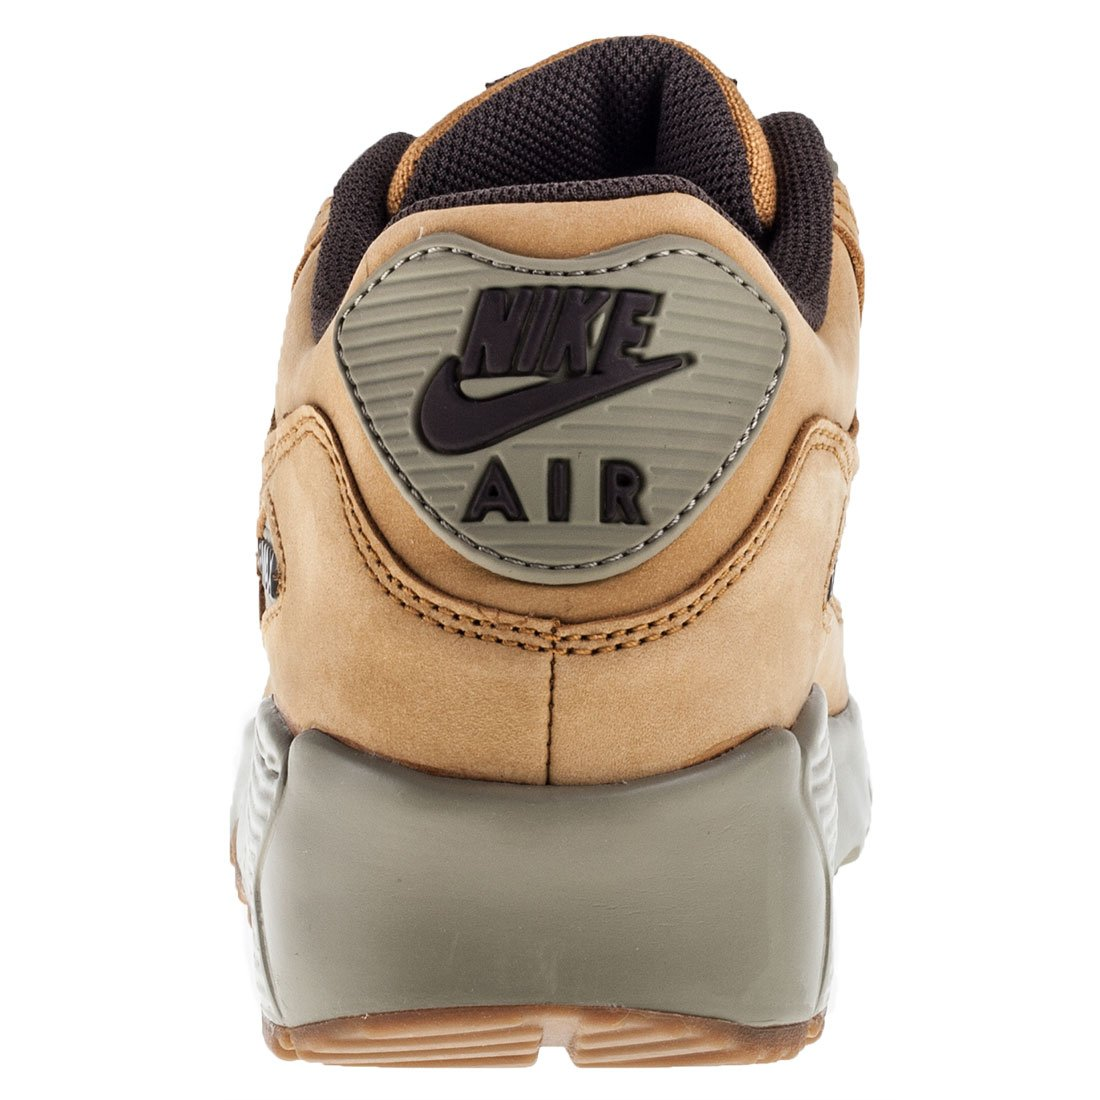 I❤️OFFERS! NIKE AIR Max 90 Winter PRM Wheat Bronze 943747